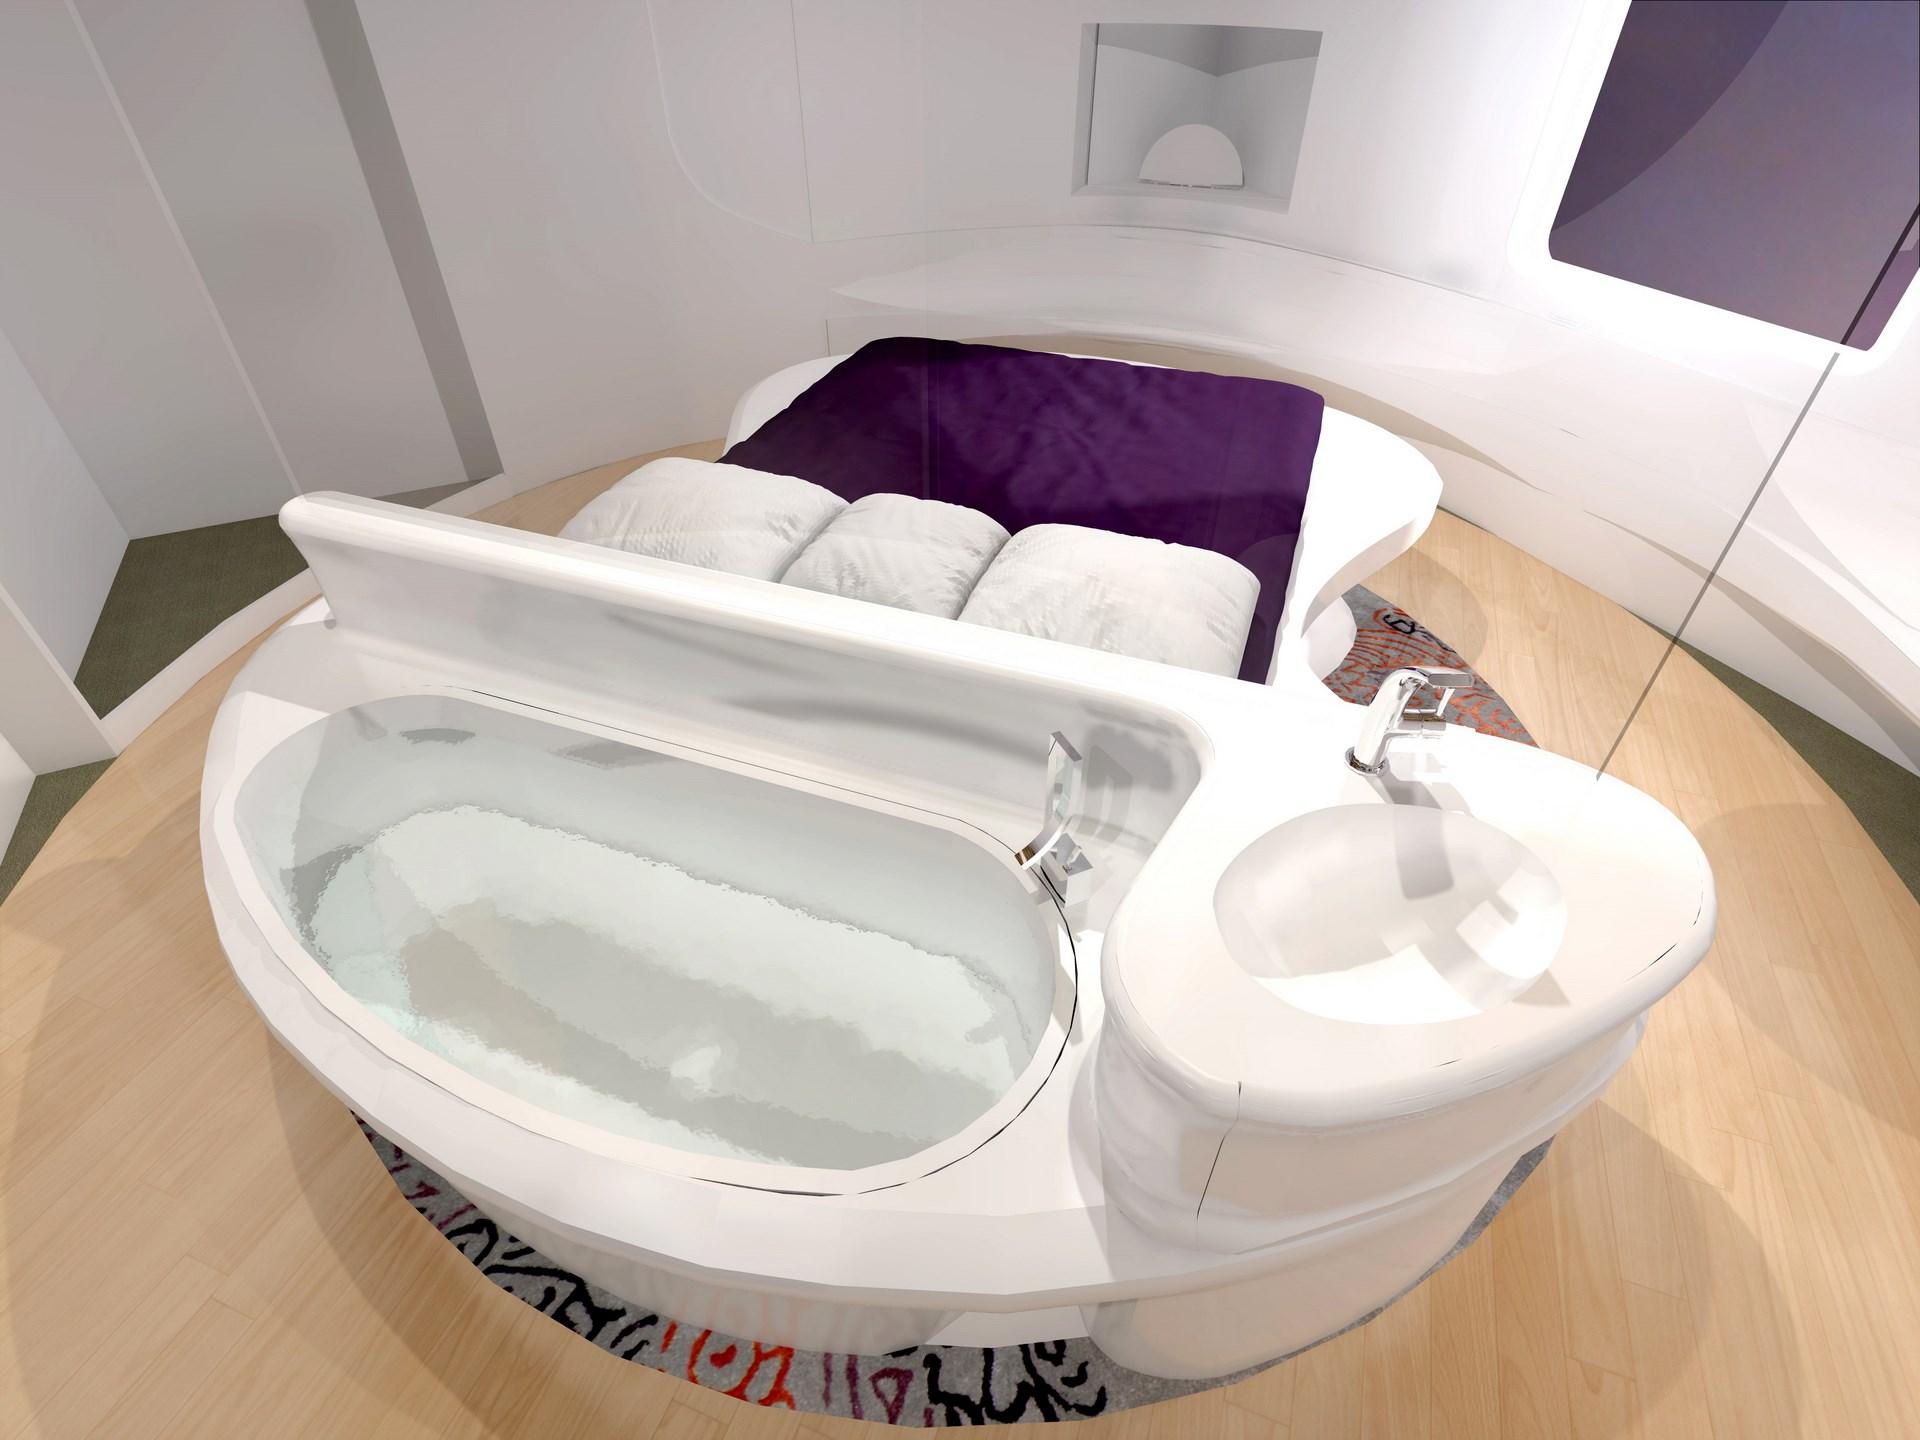 jaccuzzi concept hotel innovant agence avous